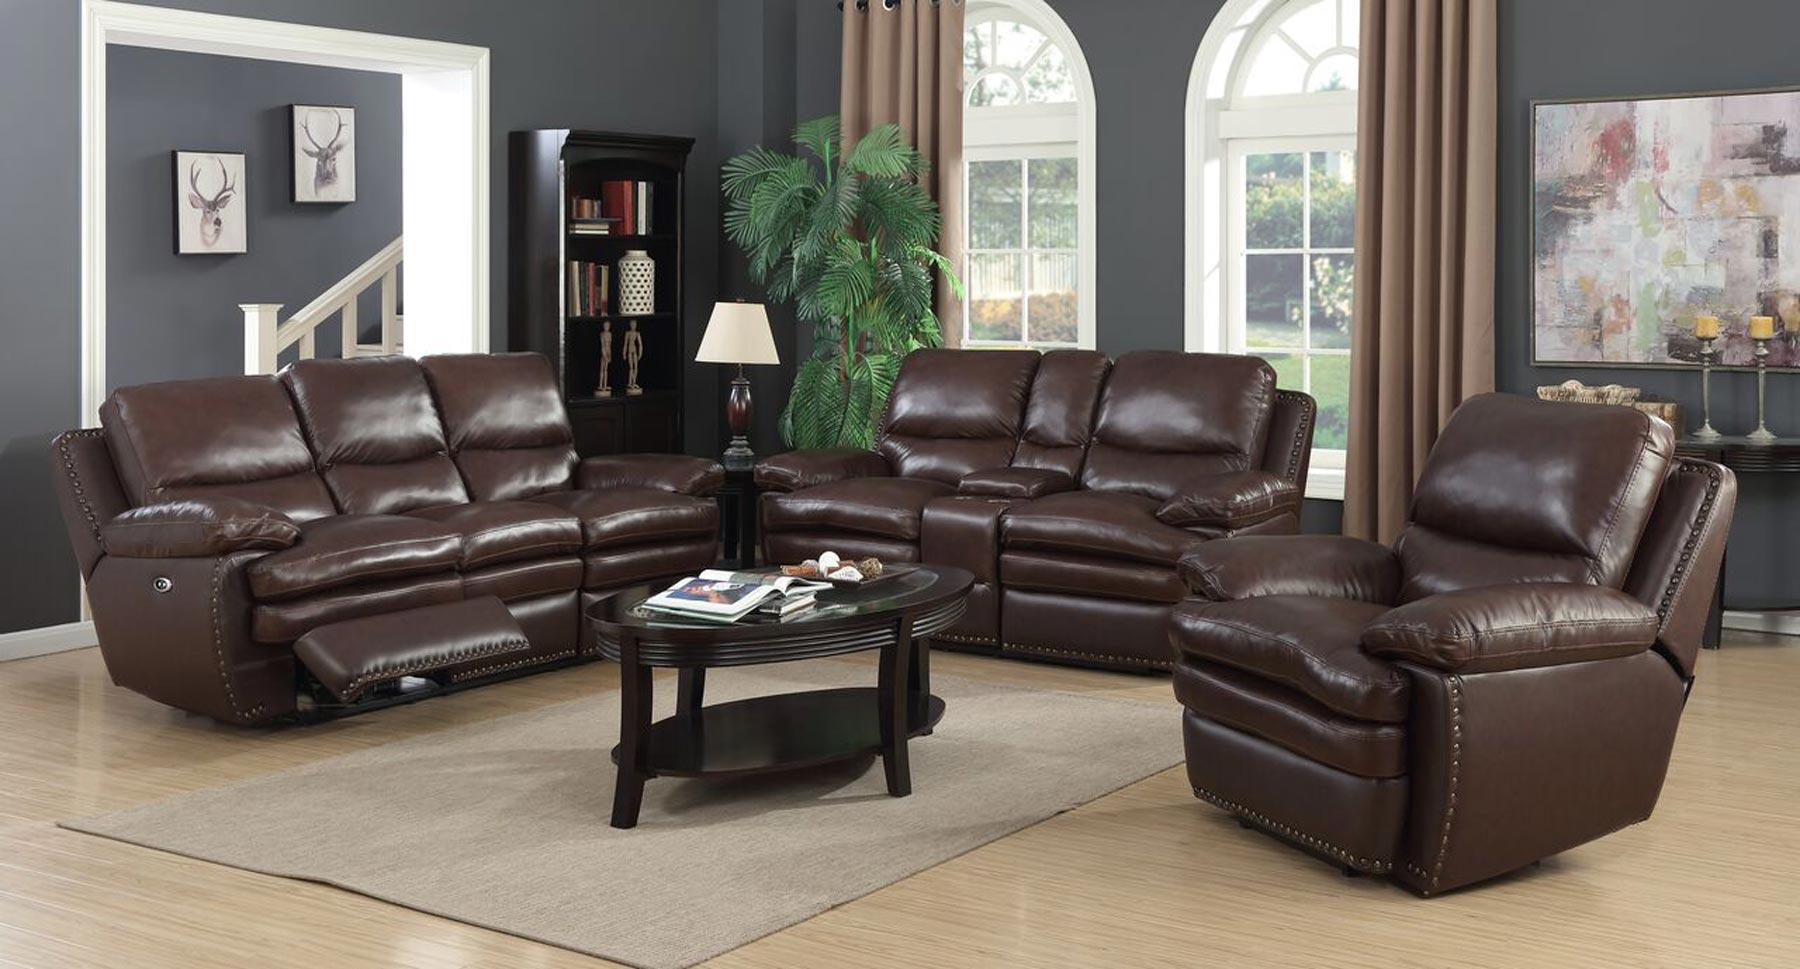 Verona 6 Piece Sectional | Gonzalez Furniture